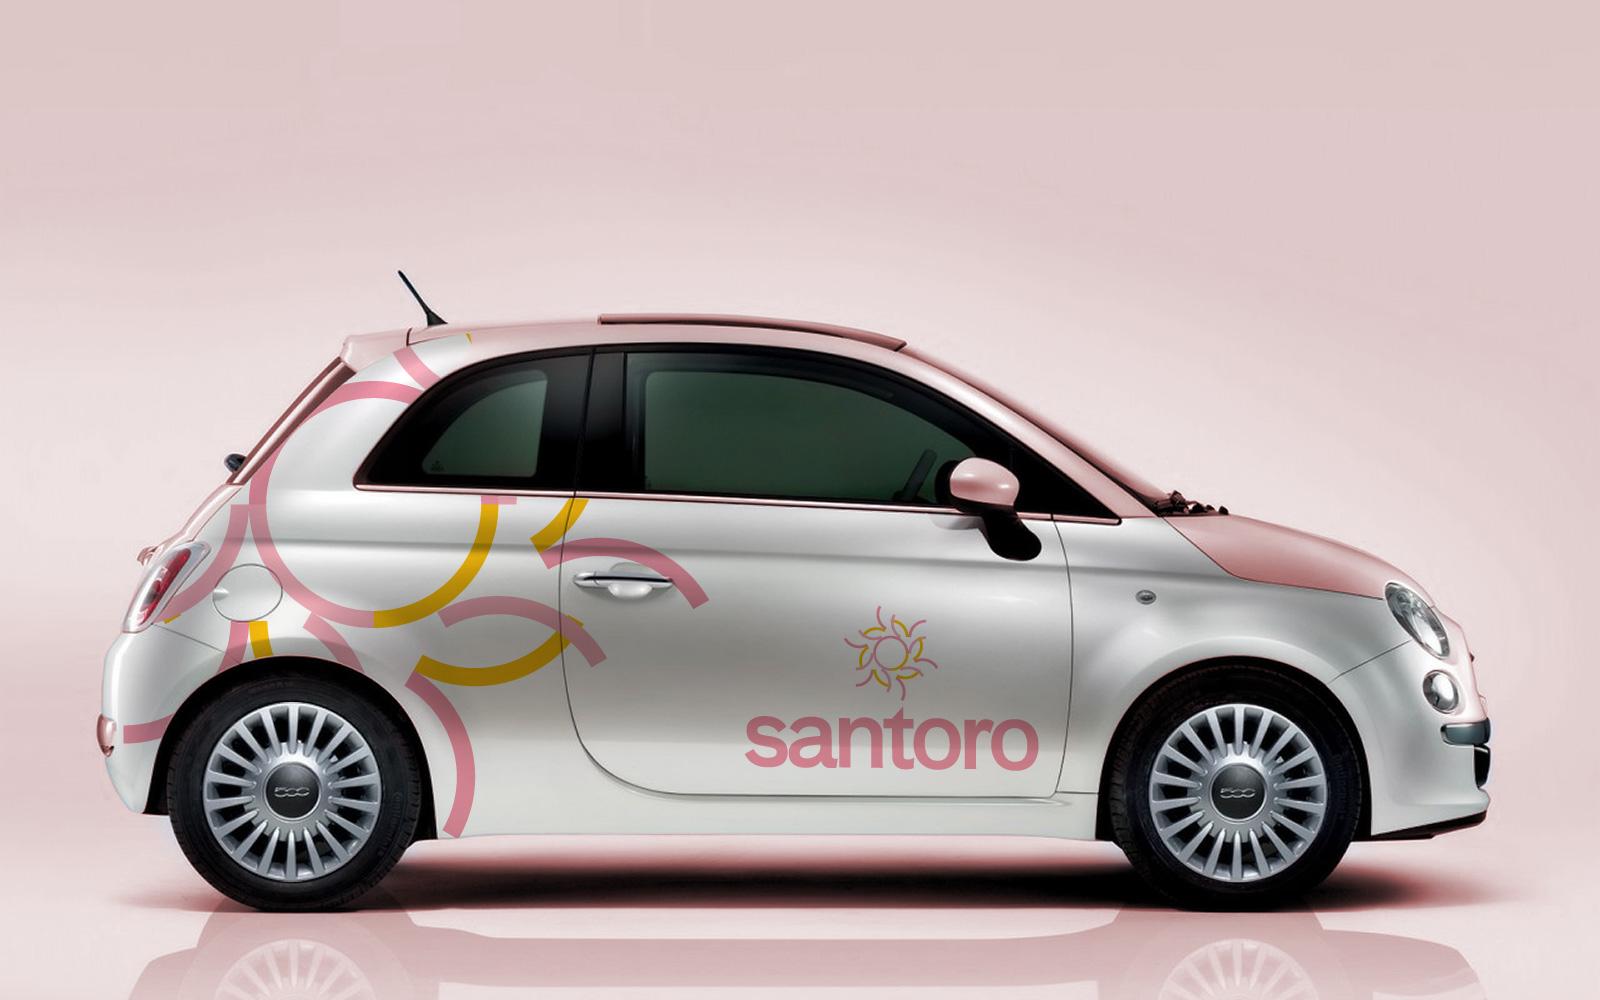 Santoro brand identity